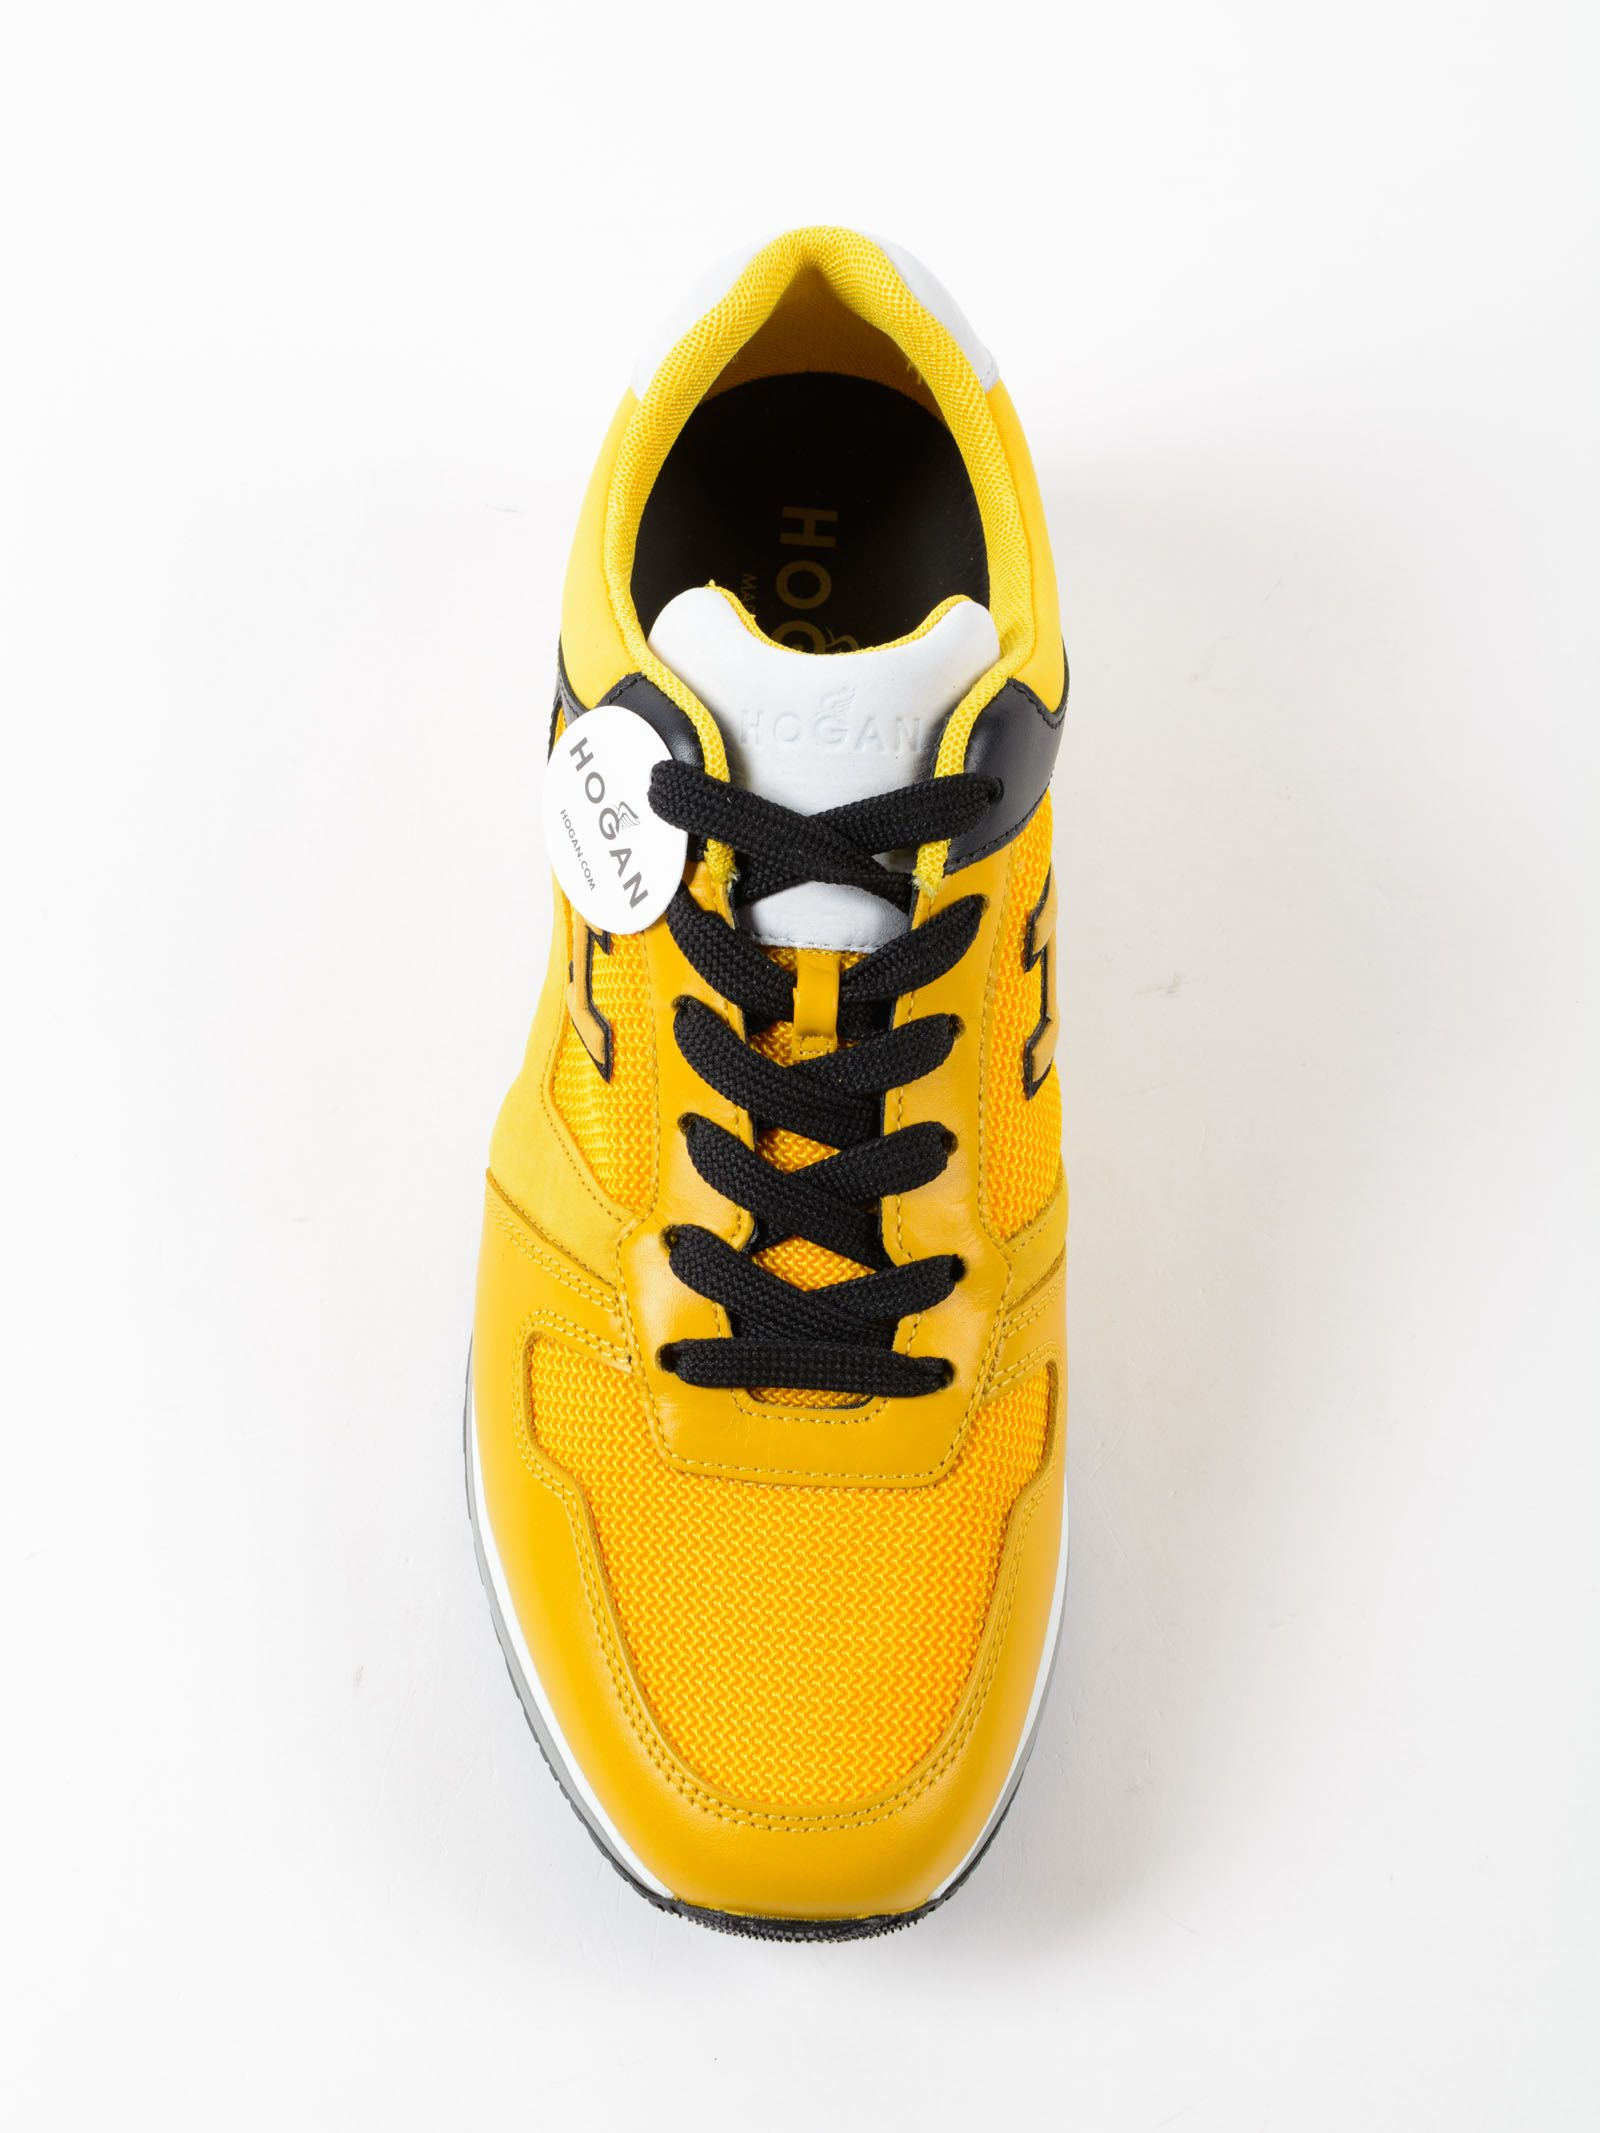 H321 sneakers - Yellow & Orange Hogan tVI3lRZ6v